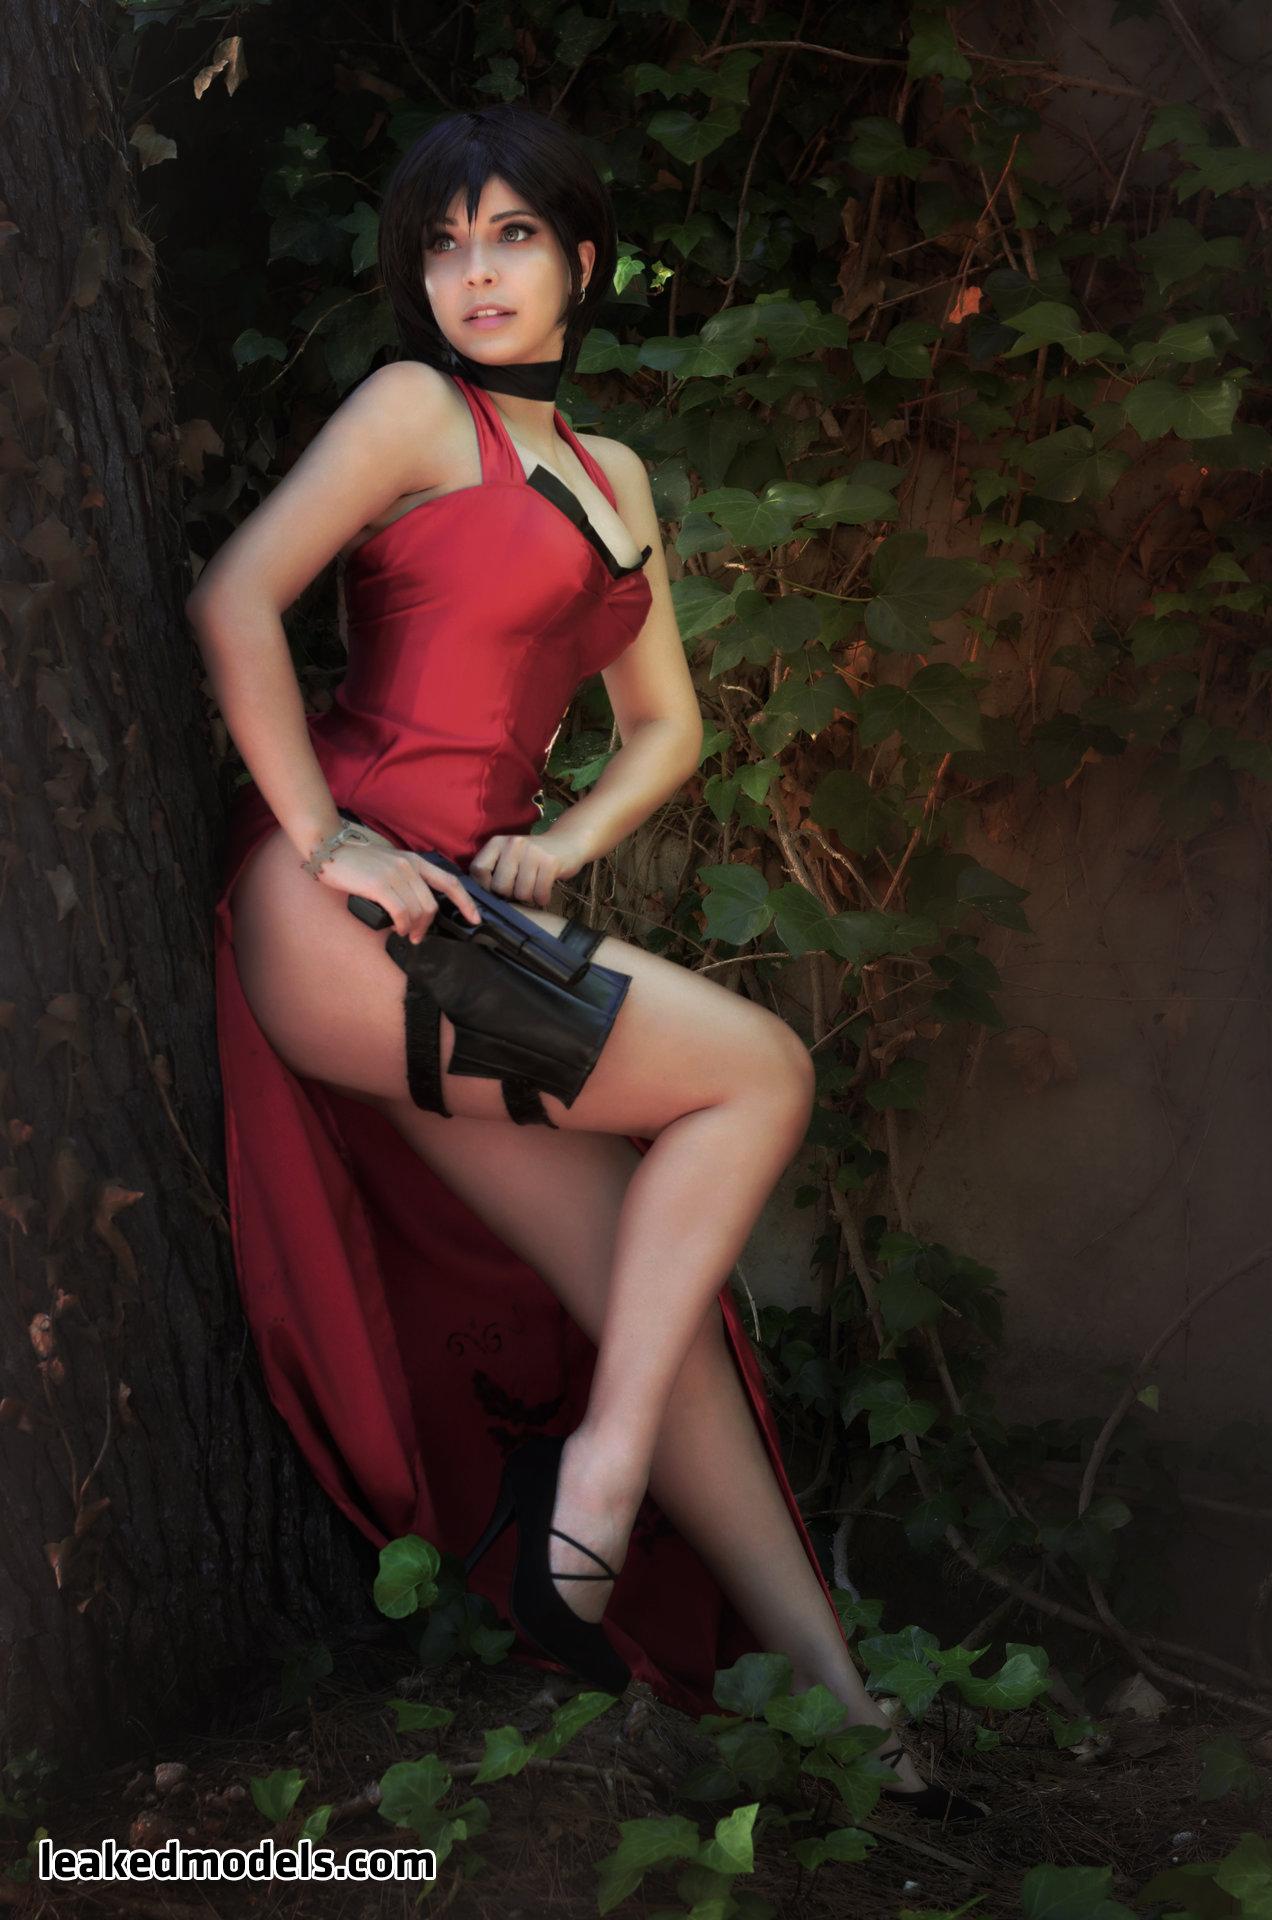 Shermie Cosplay – shermie_cos Instagram Sexy Leaks (33 Photos)